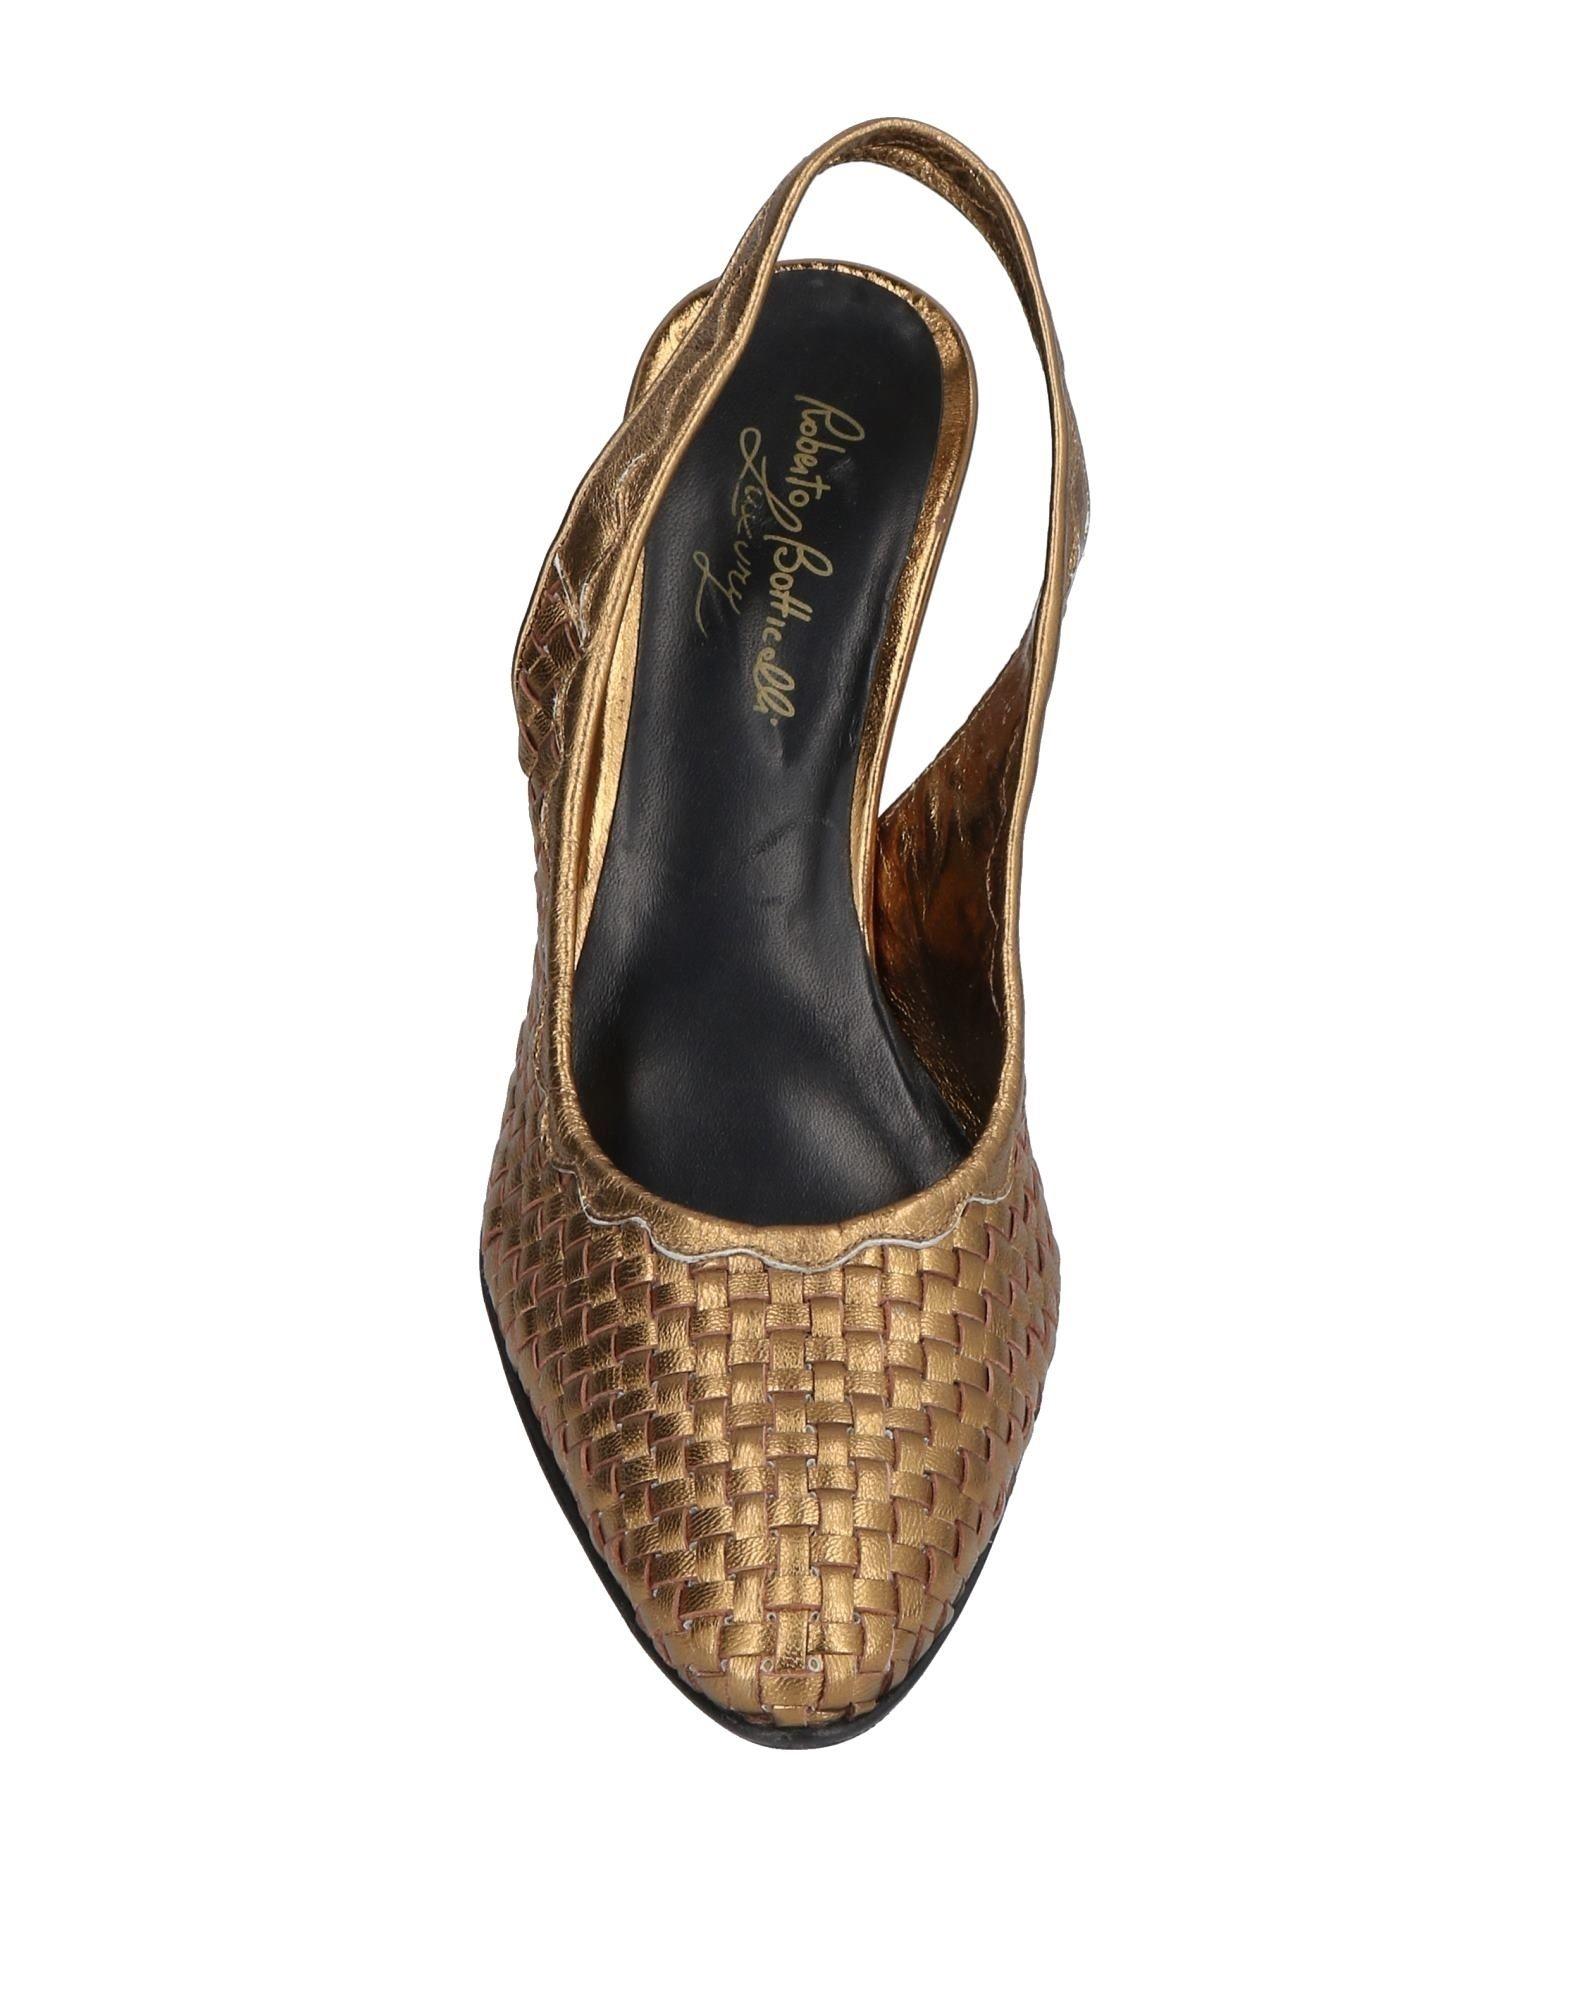 Roberto Botticelli Luxury Escarpins Femme. Nero Giardini Bottines BLACK JARDINS 19272 bottes zip femmes noires bottes talons en cu Nero Giardini soldes hK1FX4